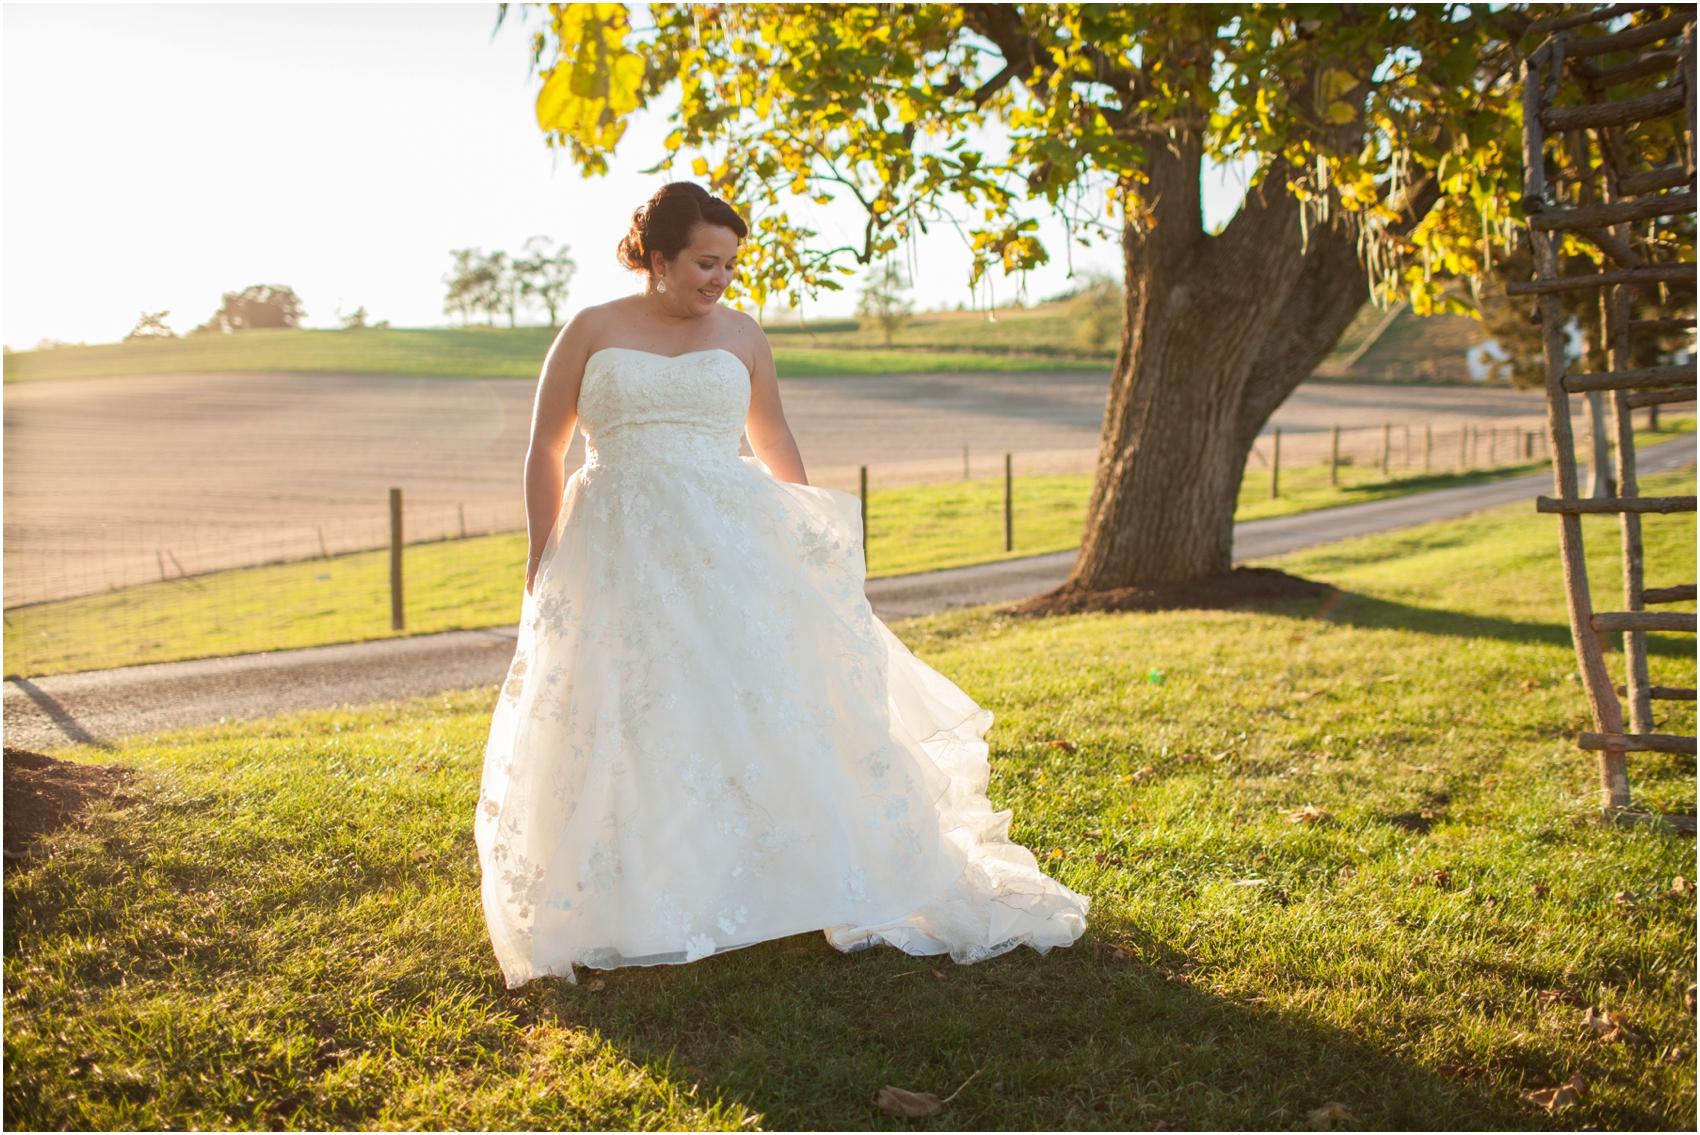 On-Sunny-Slope-Farm-Fall-Virginia-Wedding-3310.jpg